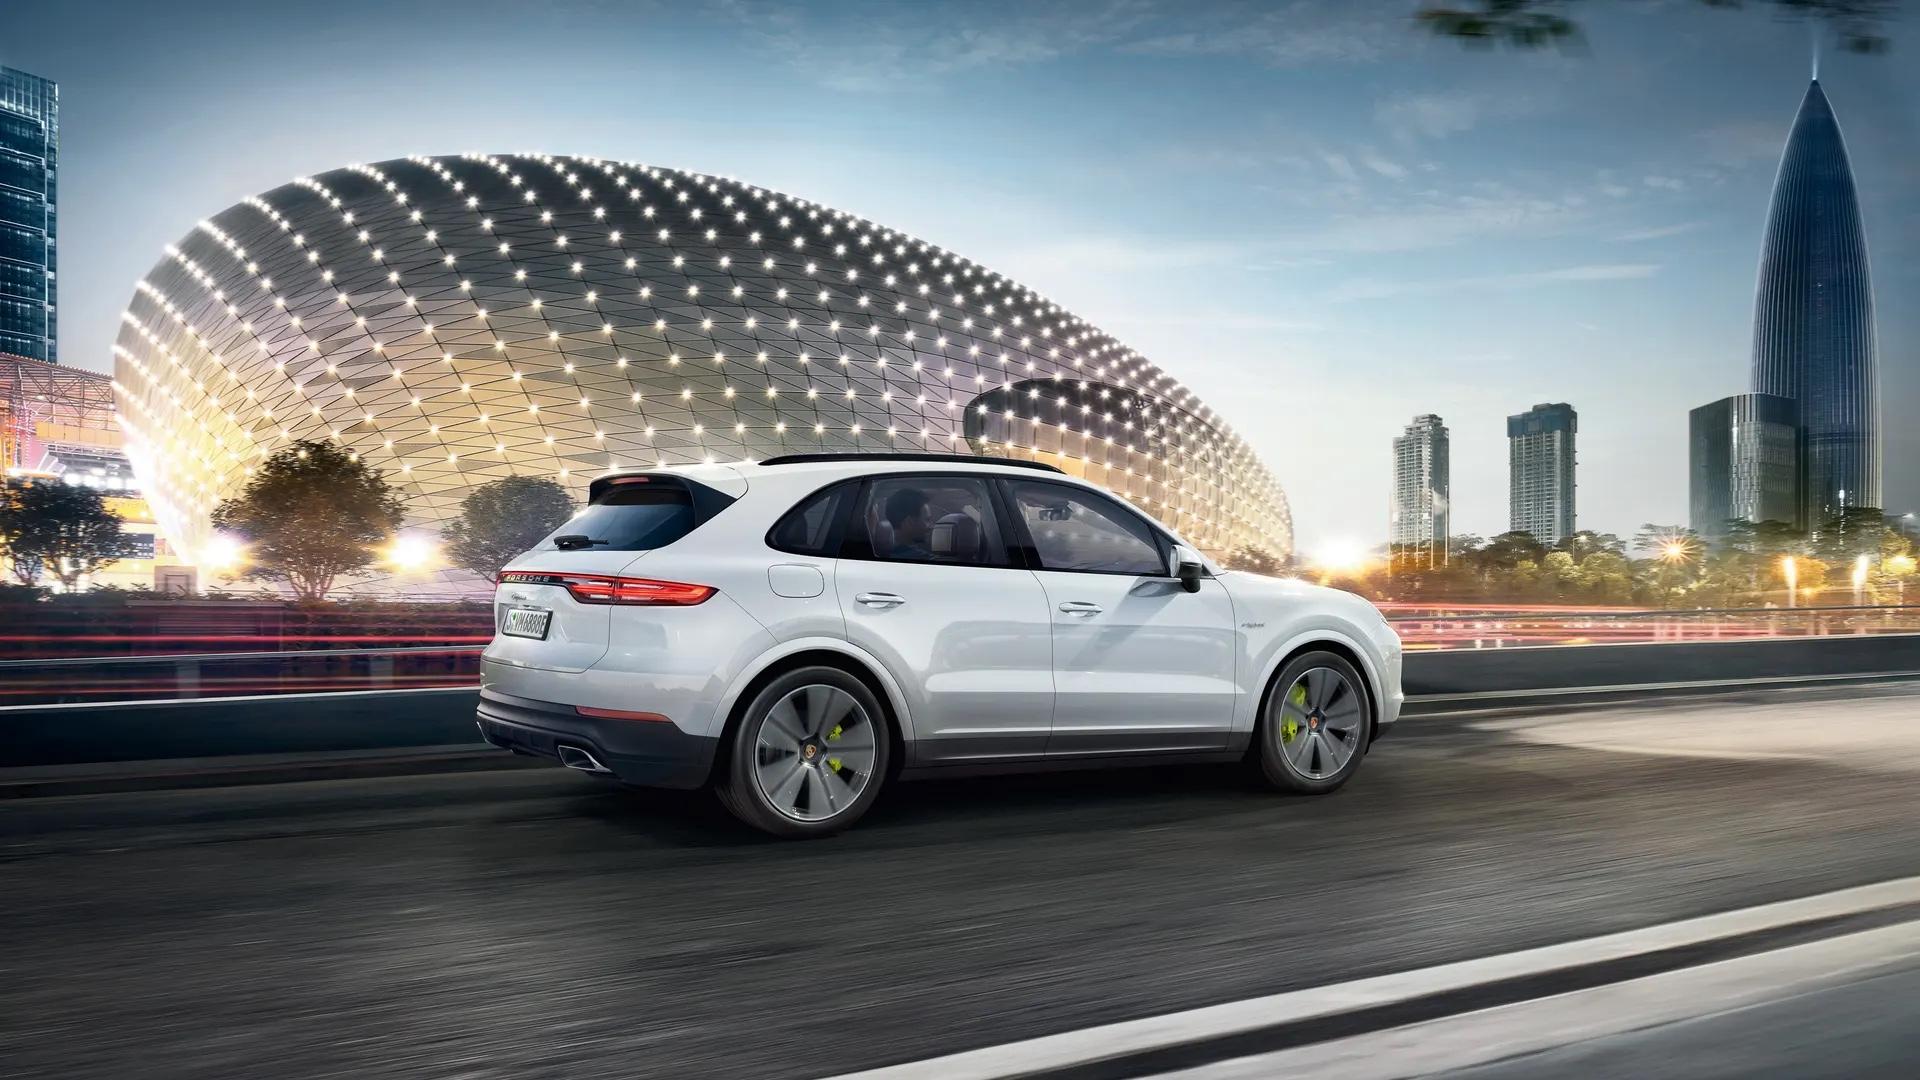 Porsche Cayenne modernissa kaupunkiympäristössä.